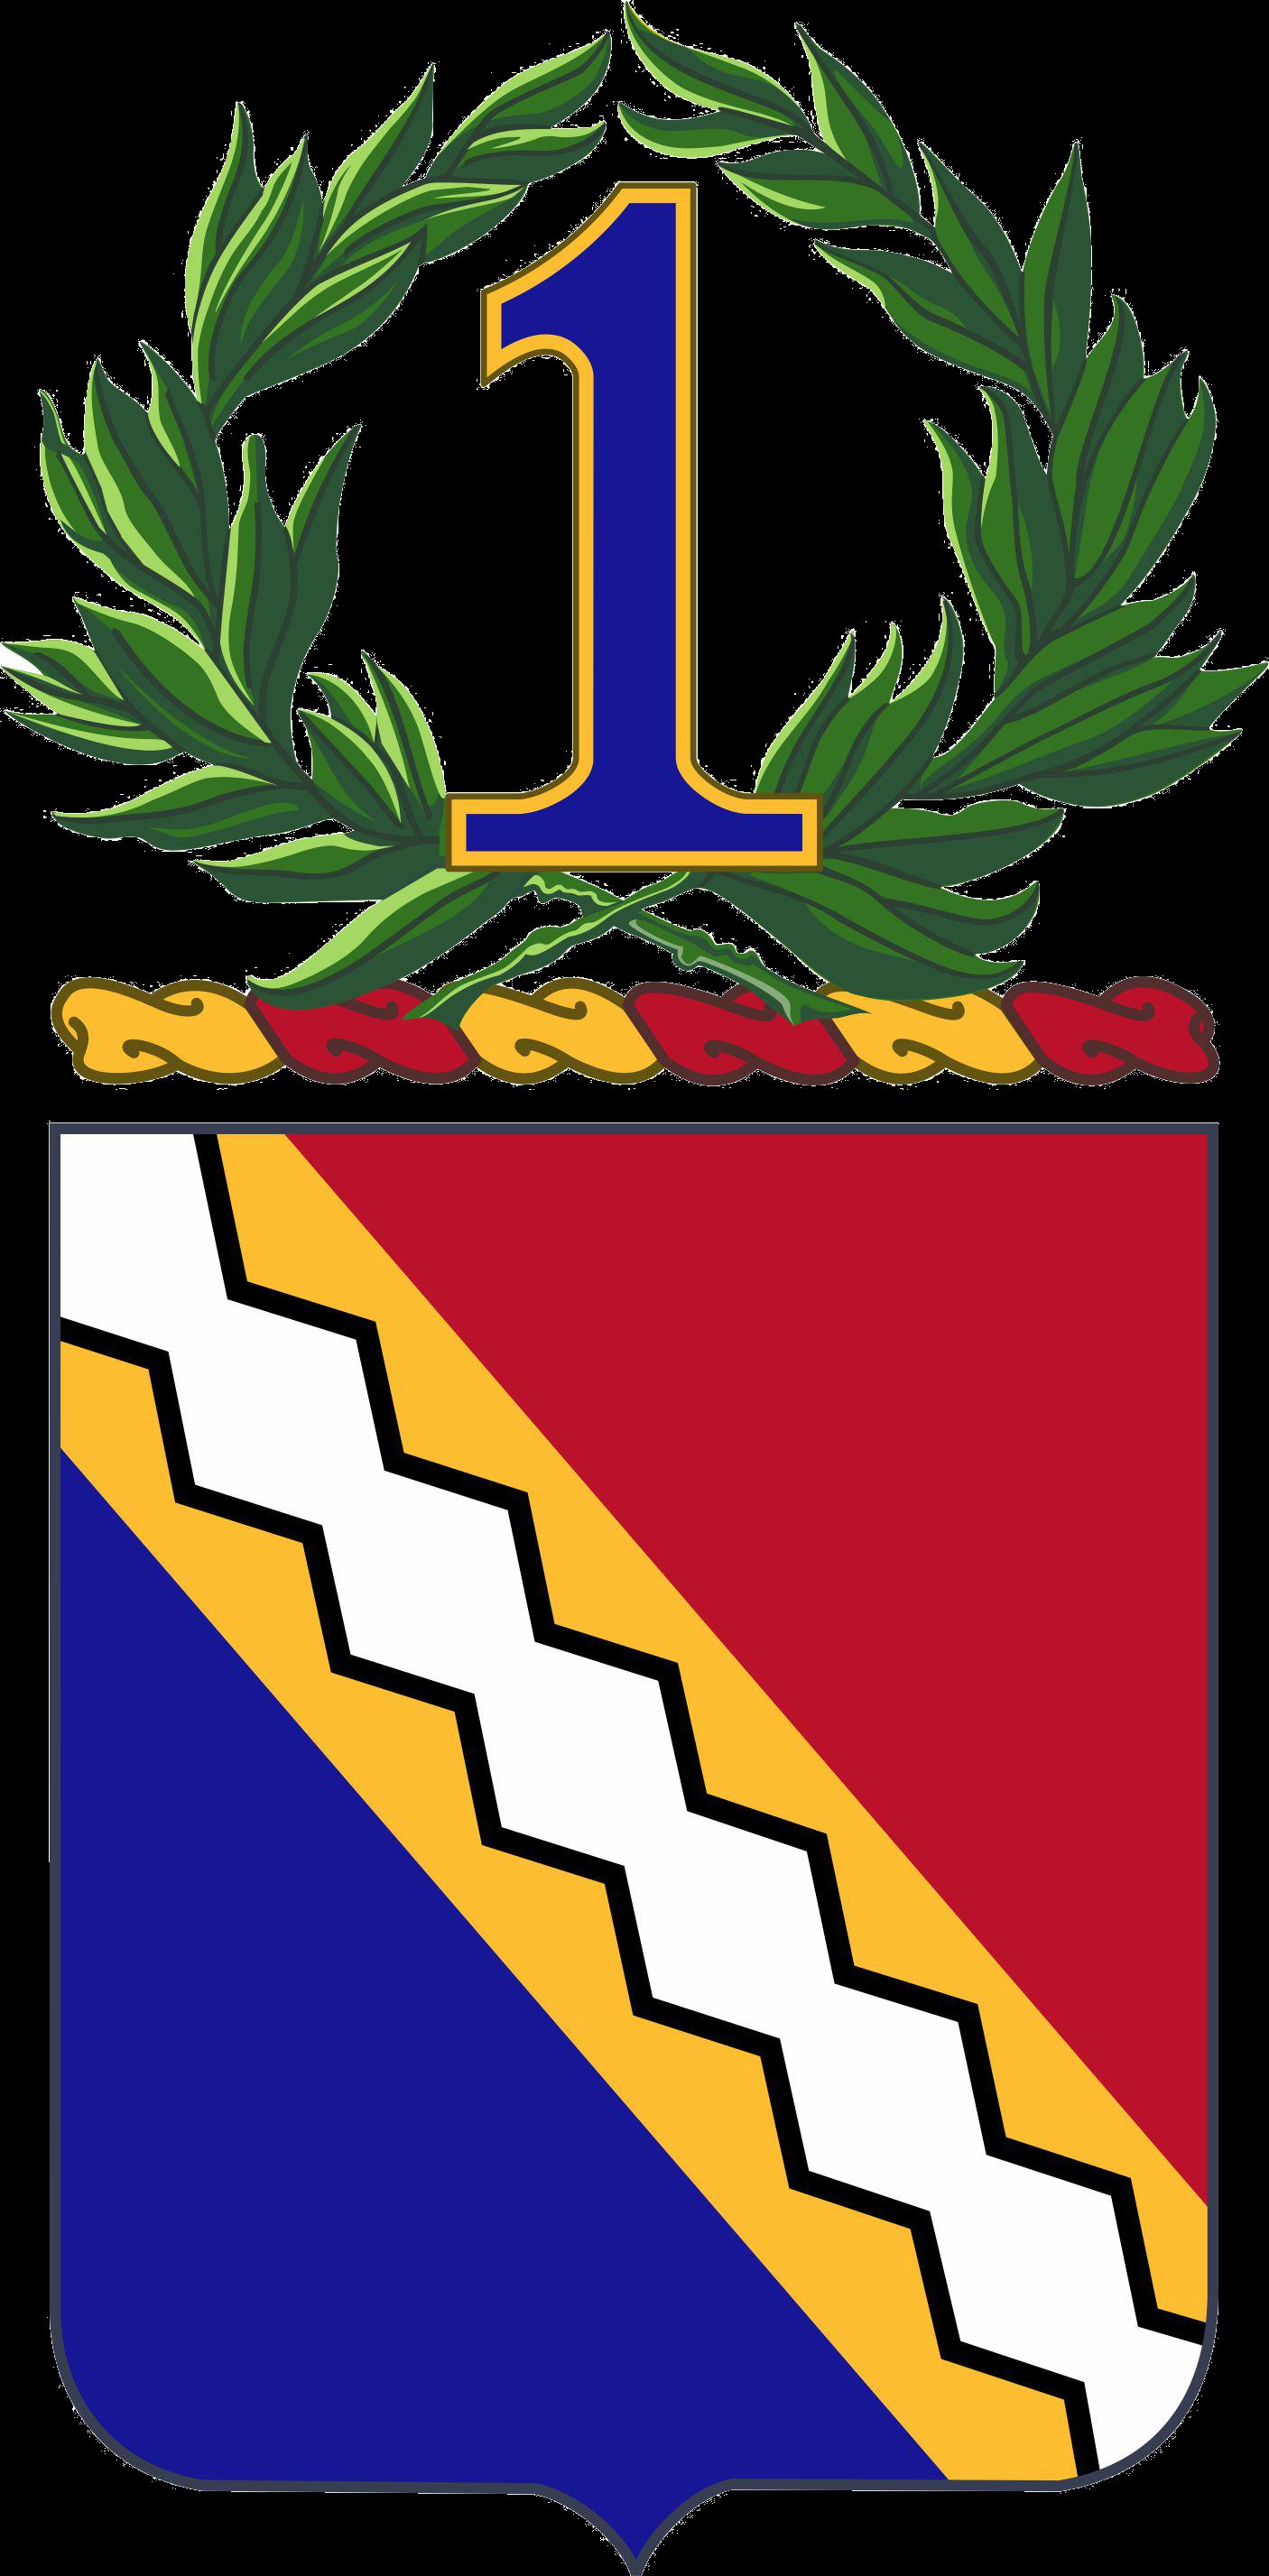 1st Infantry Regiment (United States) - Wikipedia